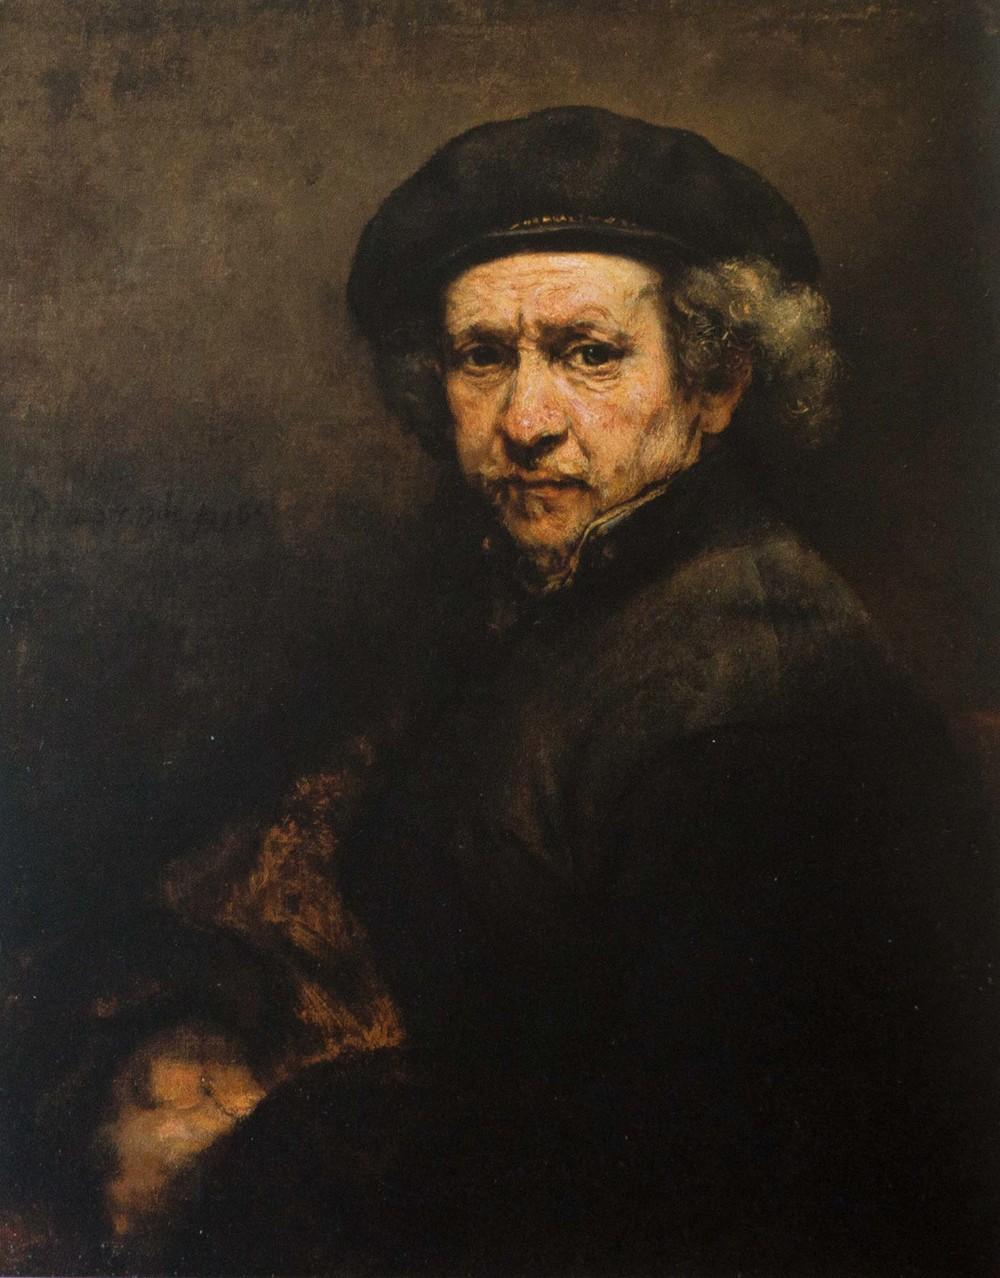 site-11-27-14 rembrandt self portrait 3.jpg